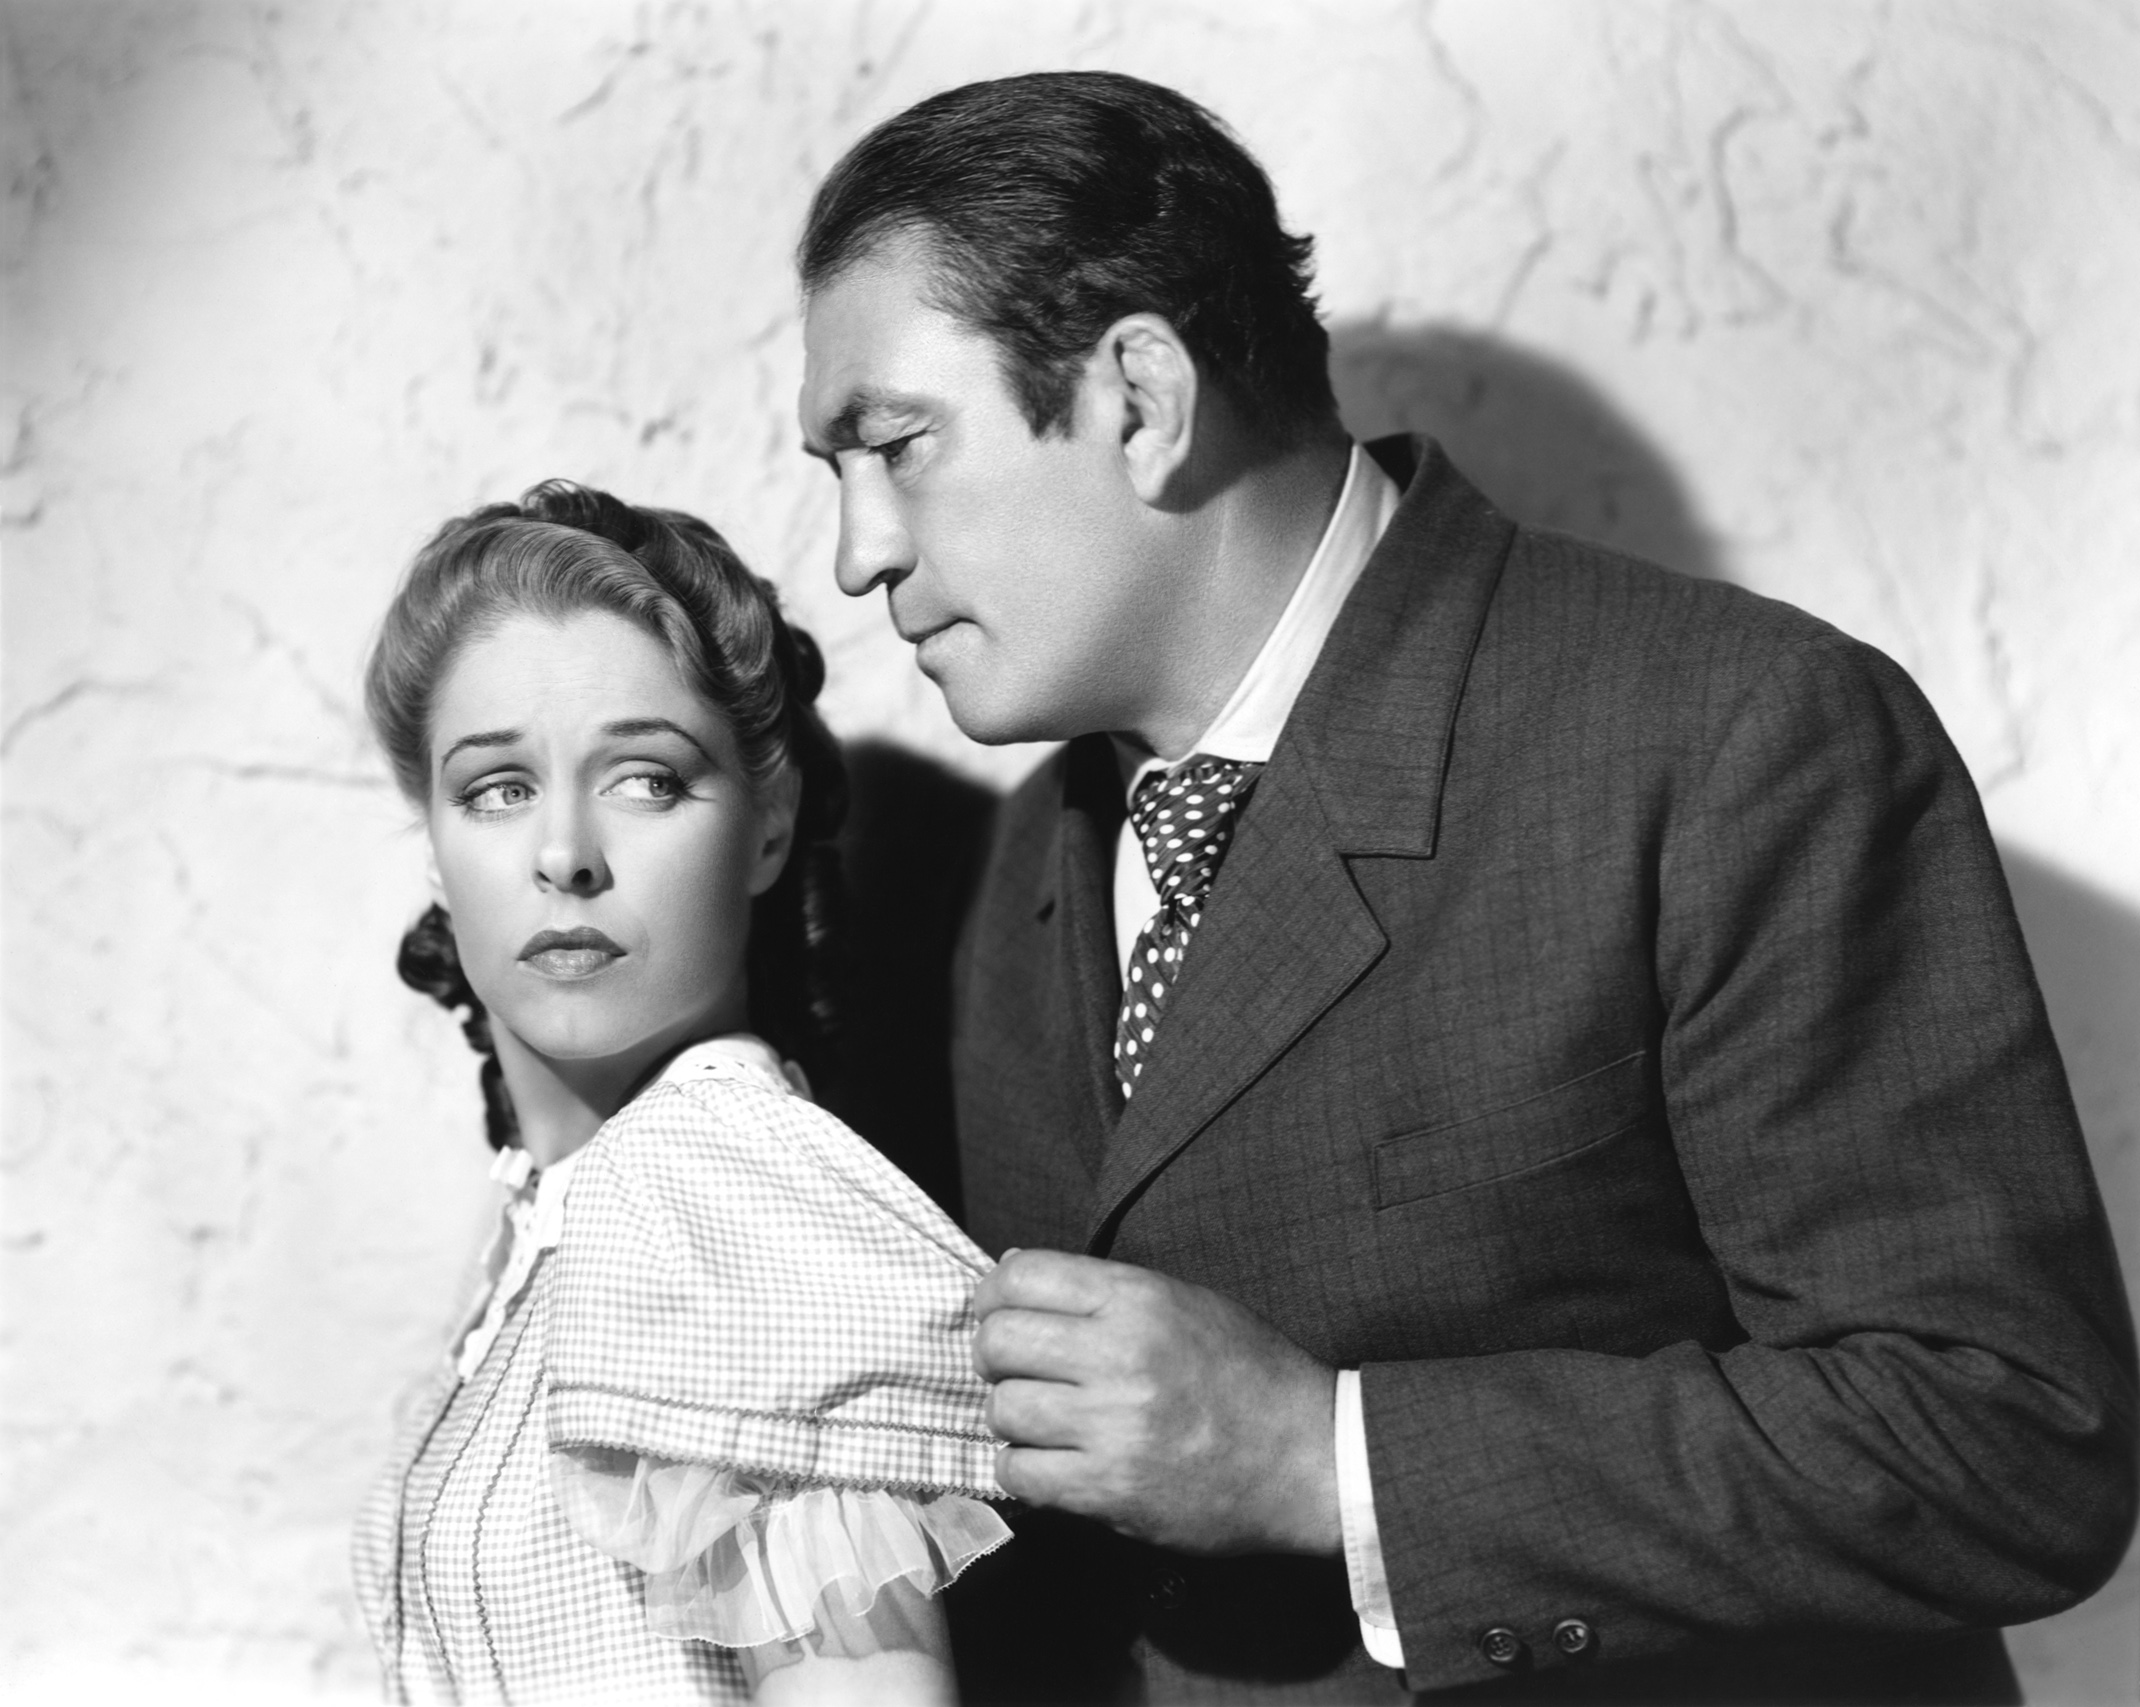 Victor McLaglen in Diamond Frontier With Anne Nagel